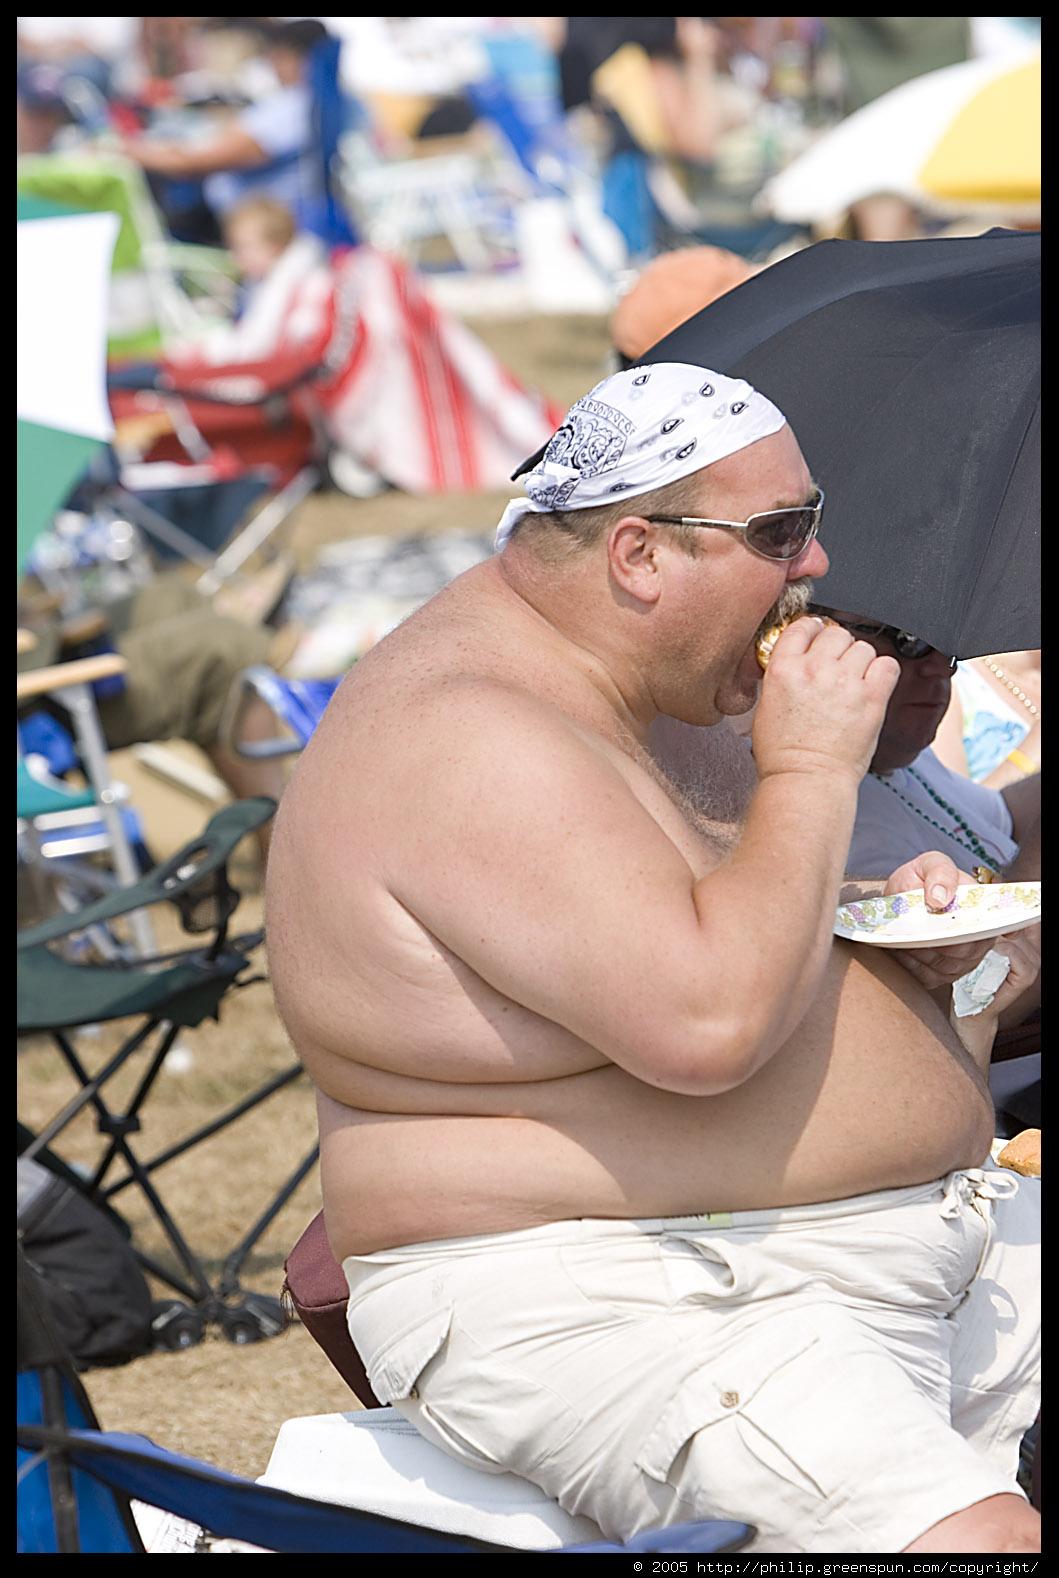 fogyni kövér ember fogyni 45 éves korban